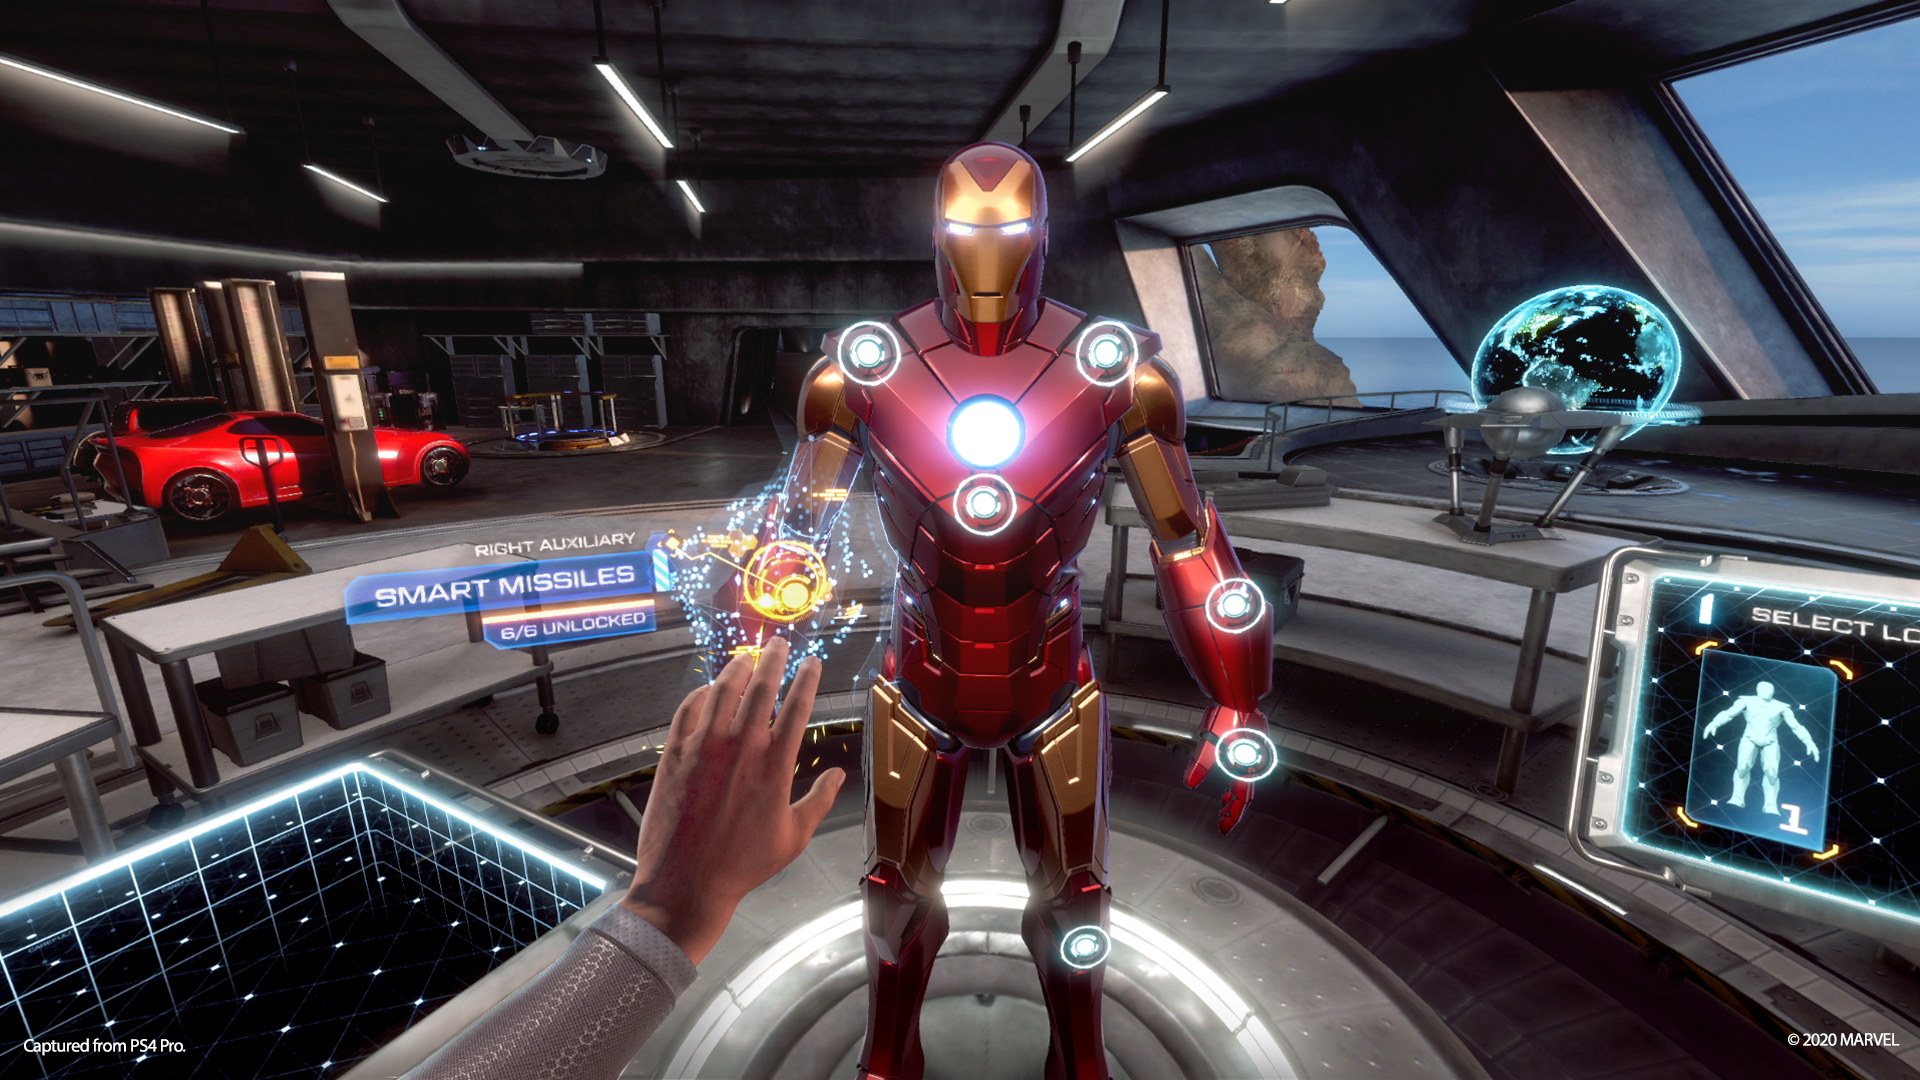 Marvel's Iron Man VR suit station